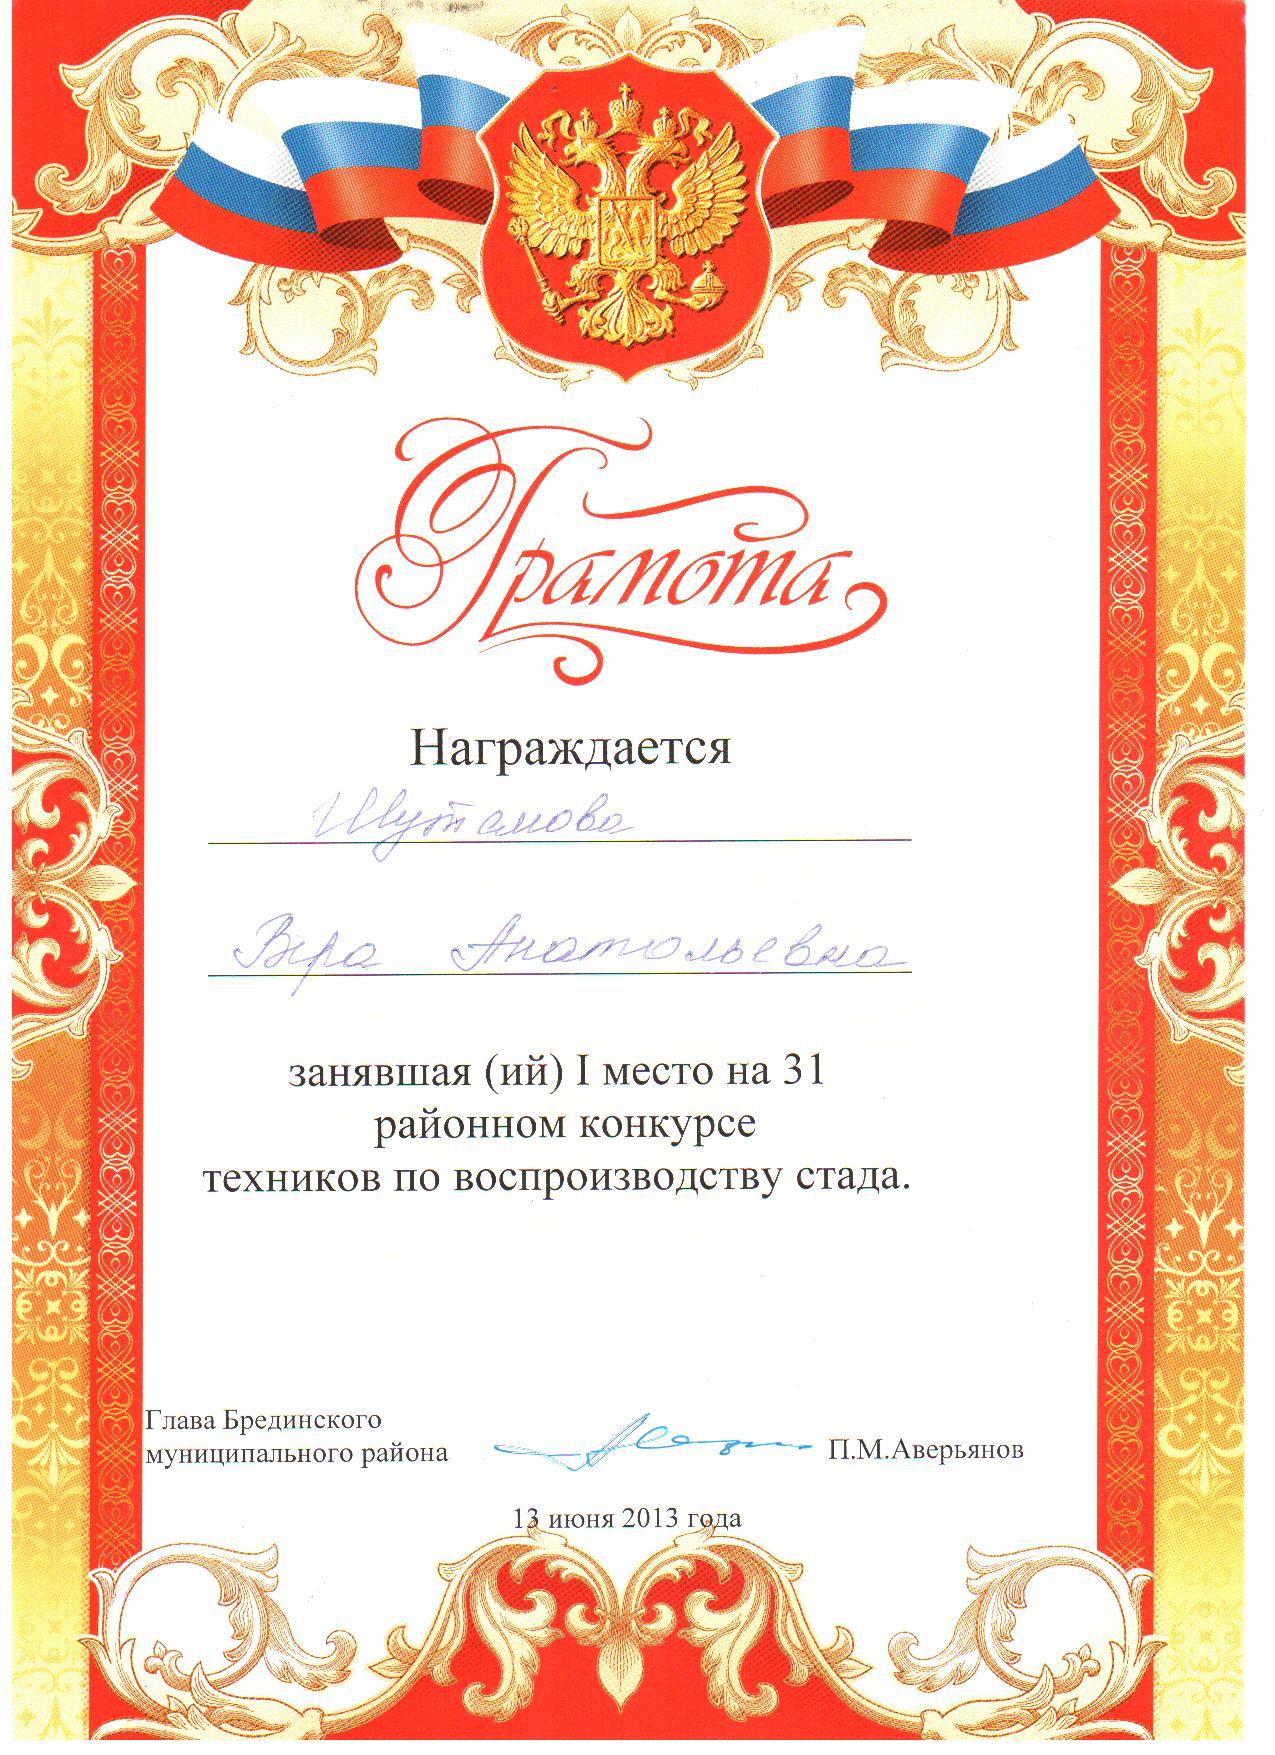 C:\Documents and Settings\Администратор\Рабочий стол\Шутёмова приложение\Изображение 010.jpg